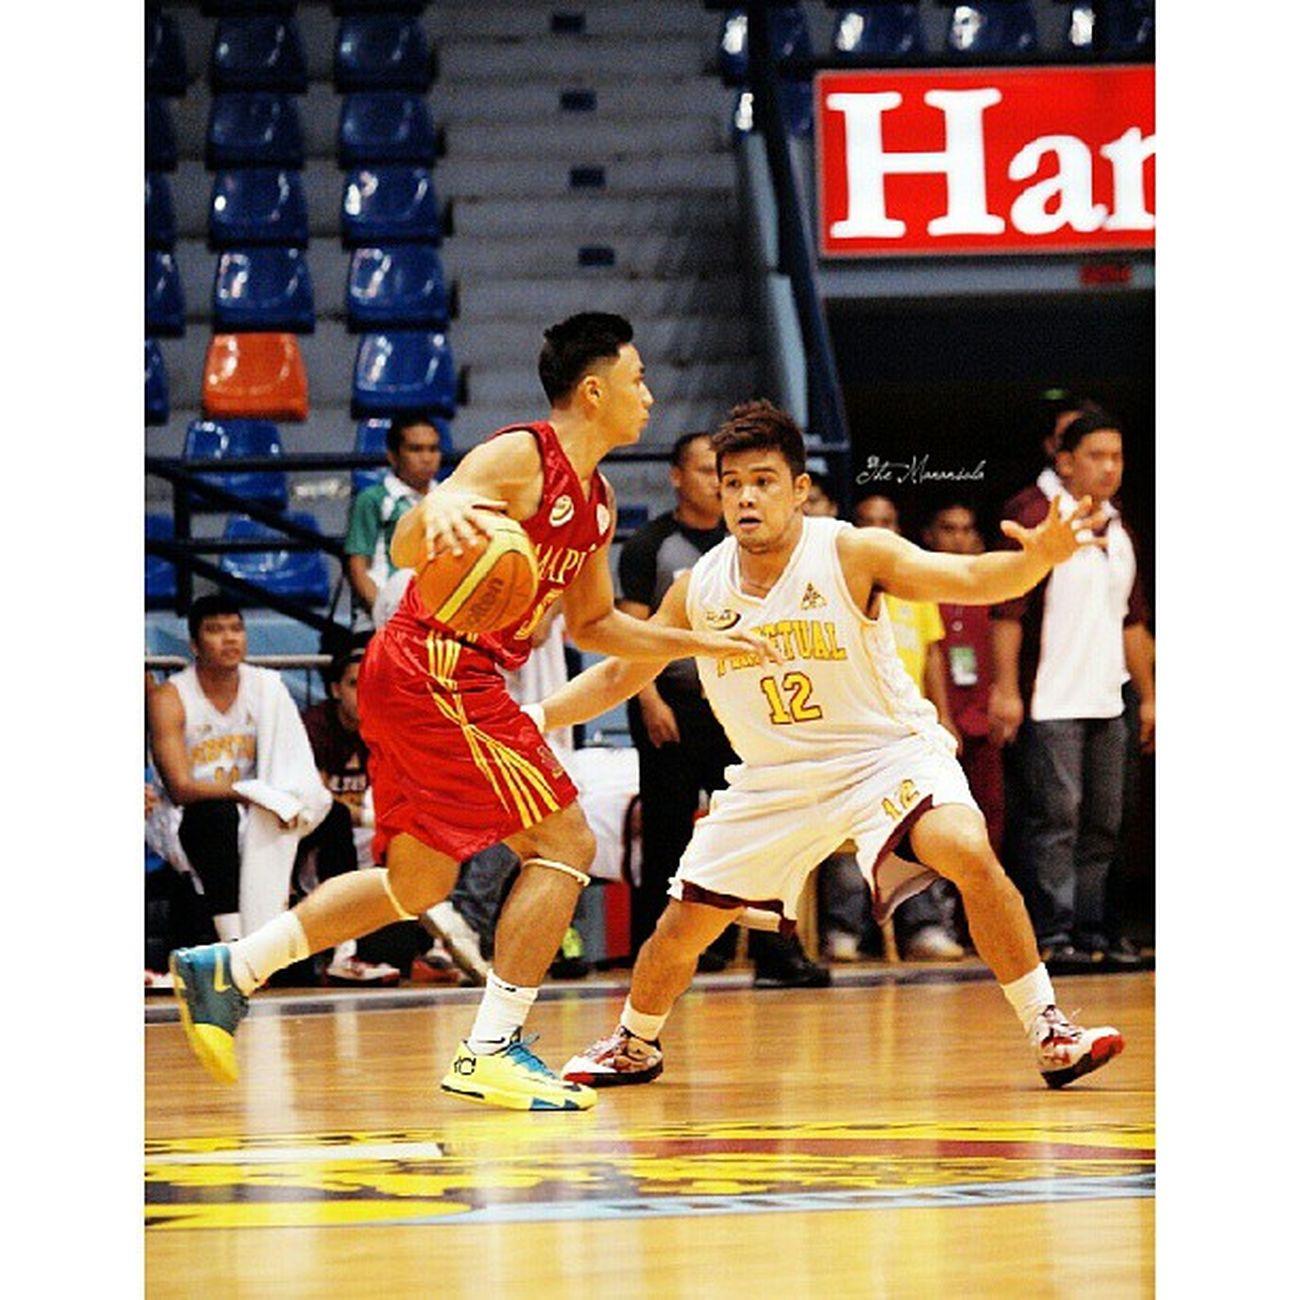 Carlos Isit @itisisit Ncaa89 MITvsUPHSD Mapuacardinals Cjisit basketball themanansala photography mit